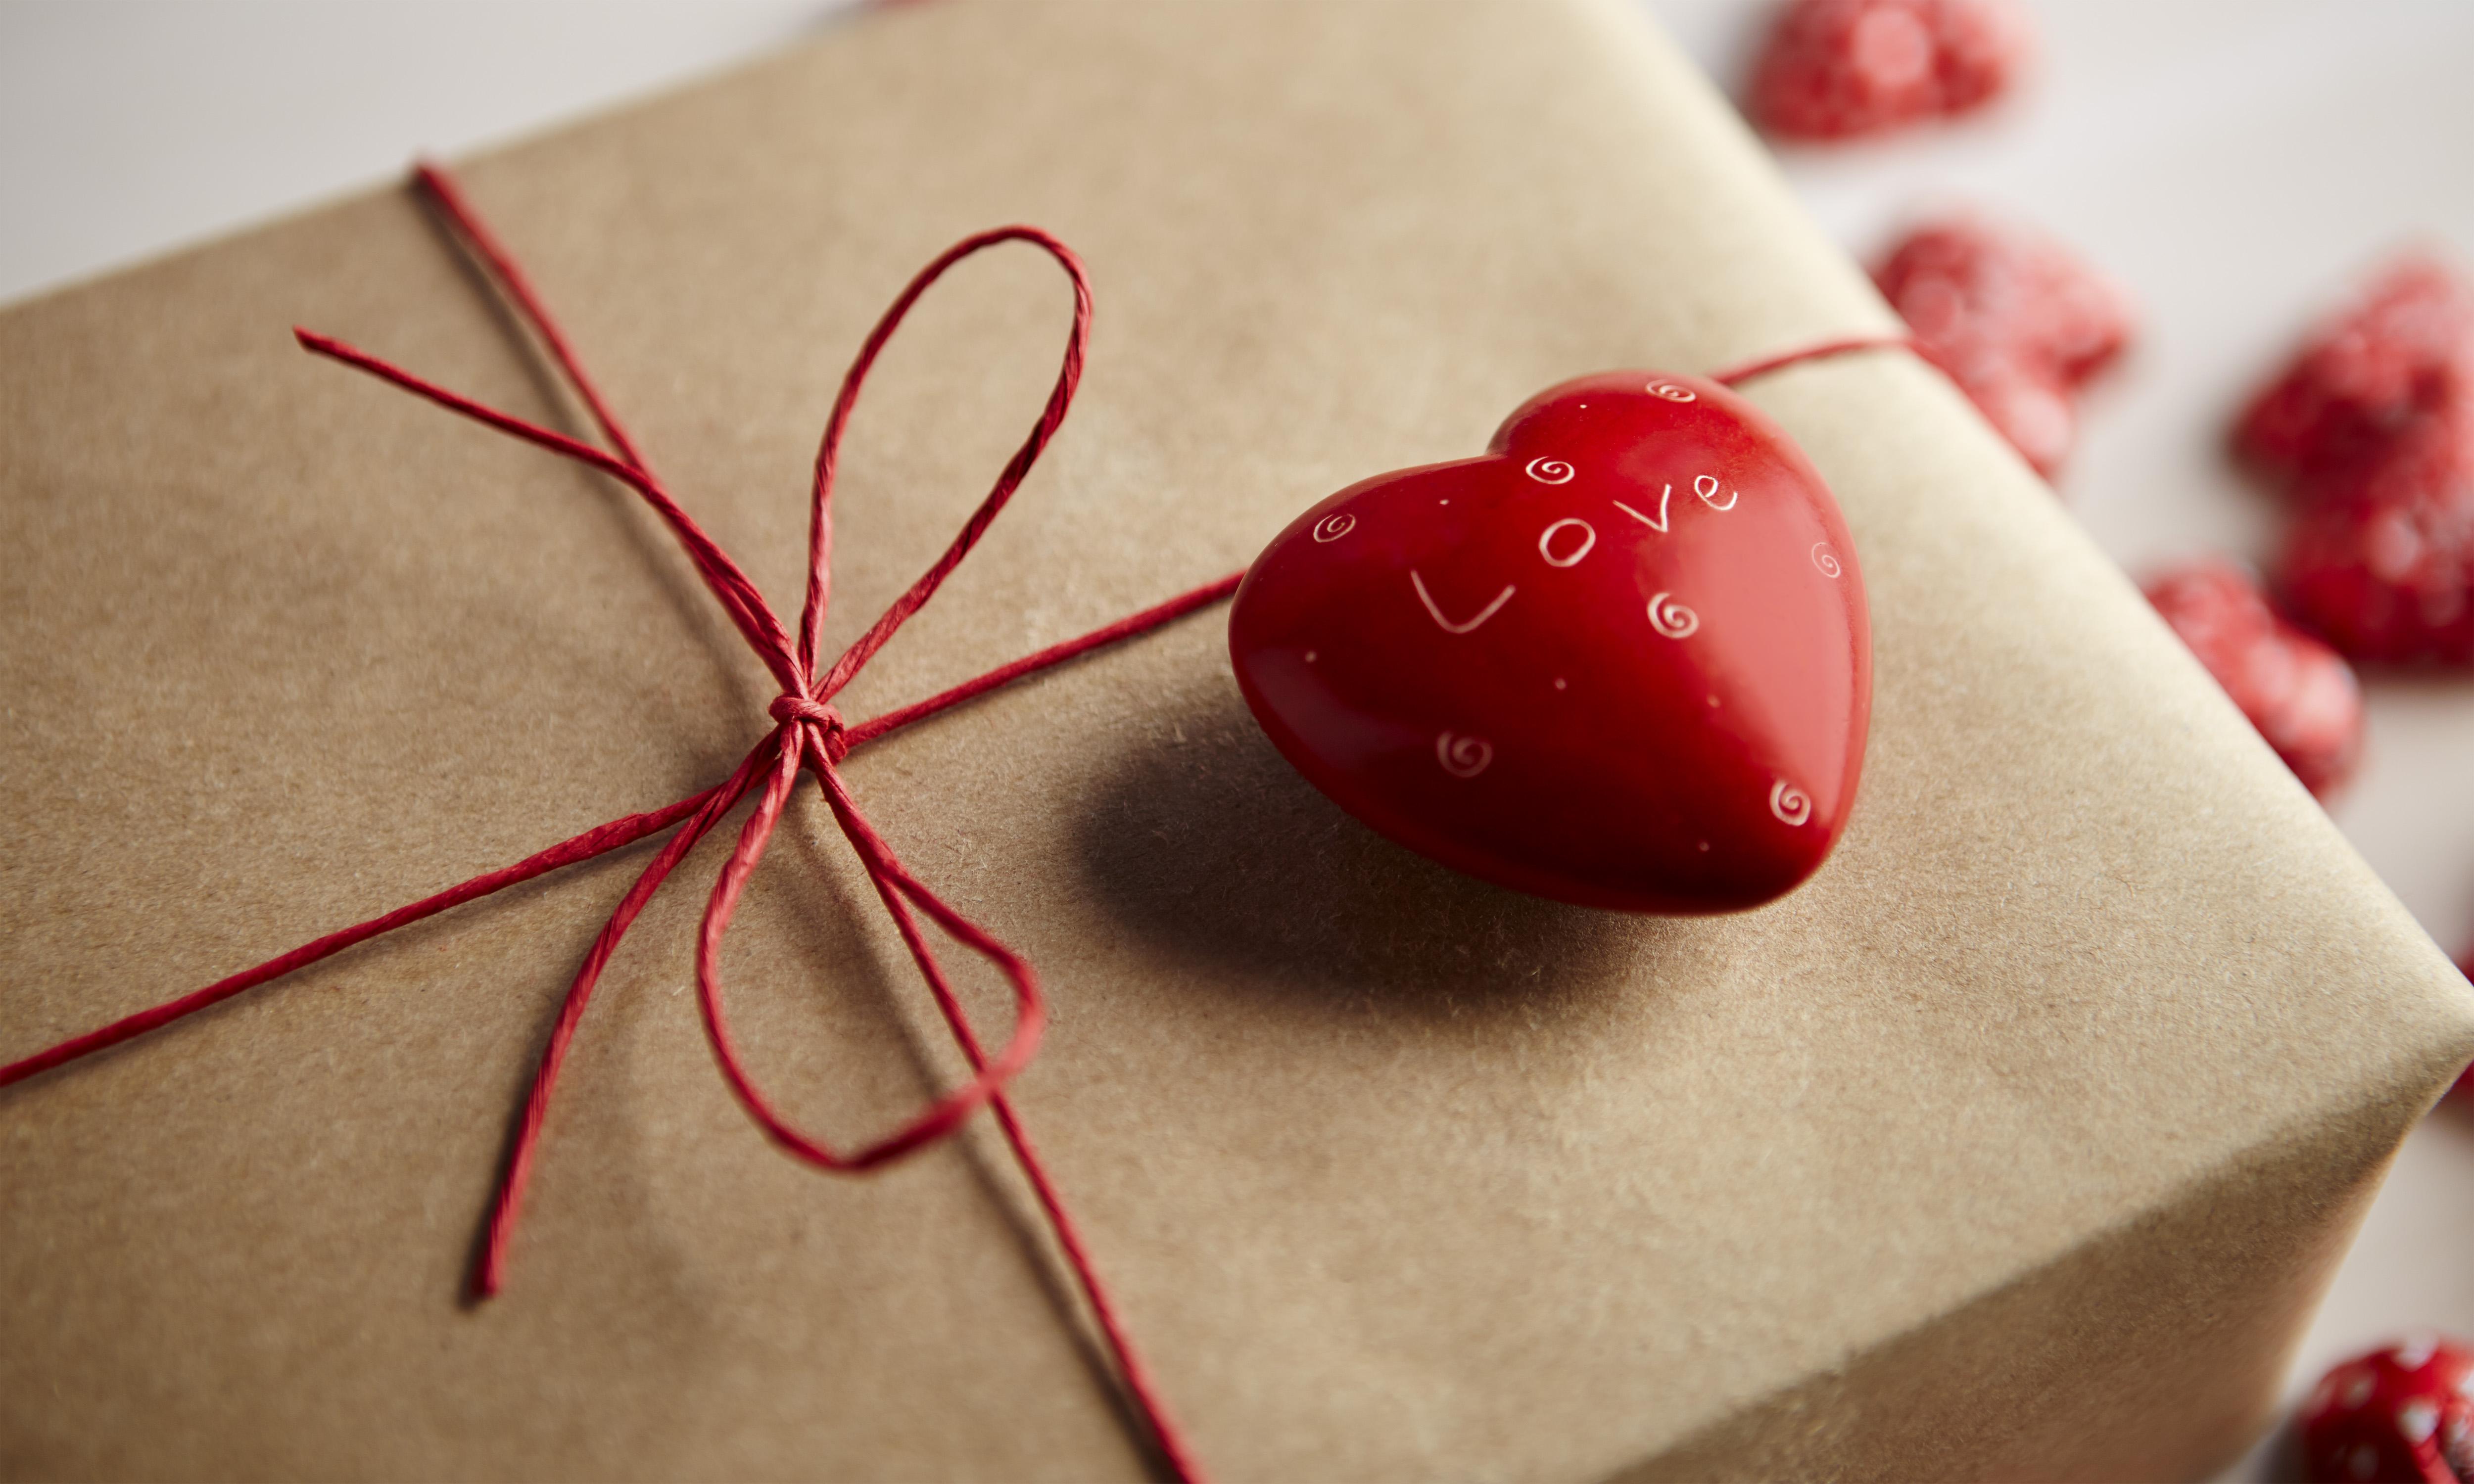 San Valentino, 6 regali originali per lui